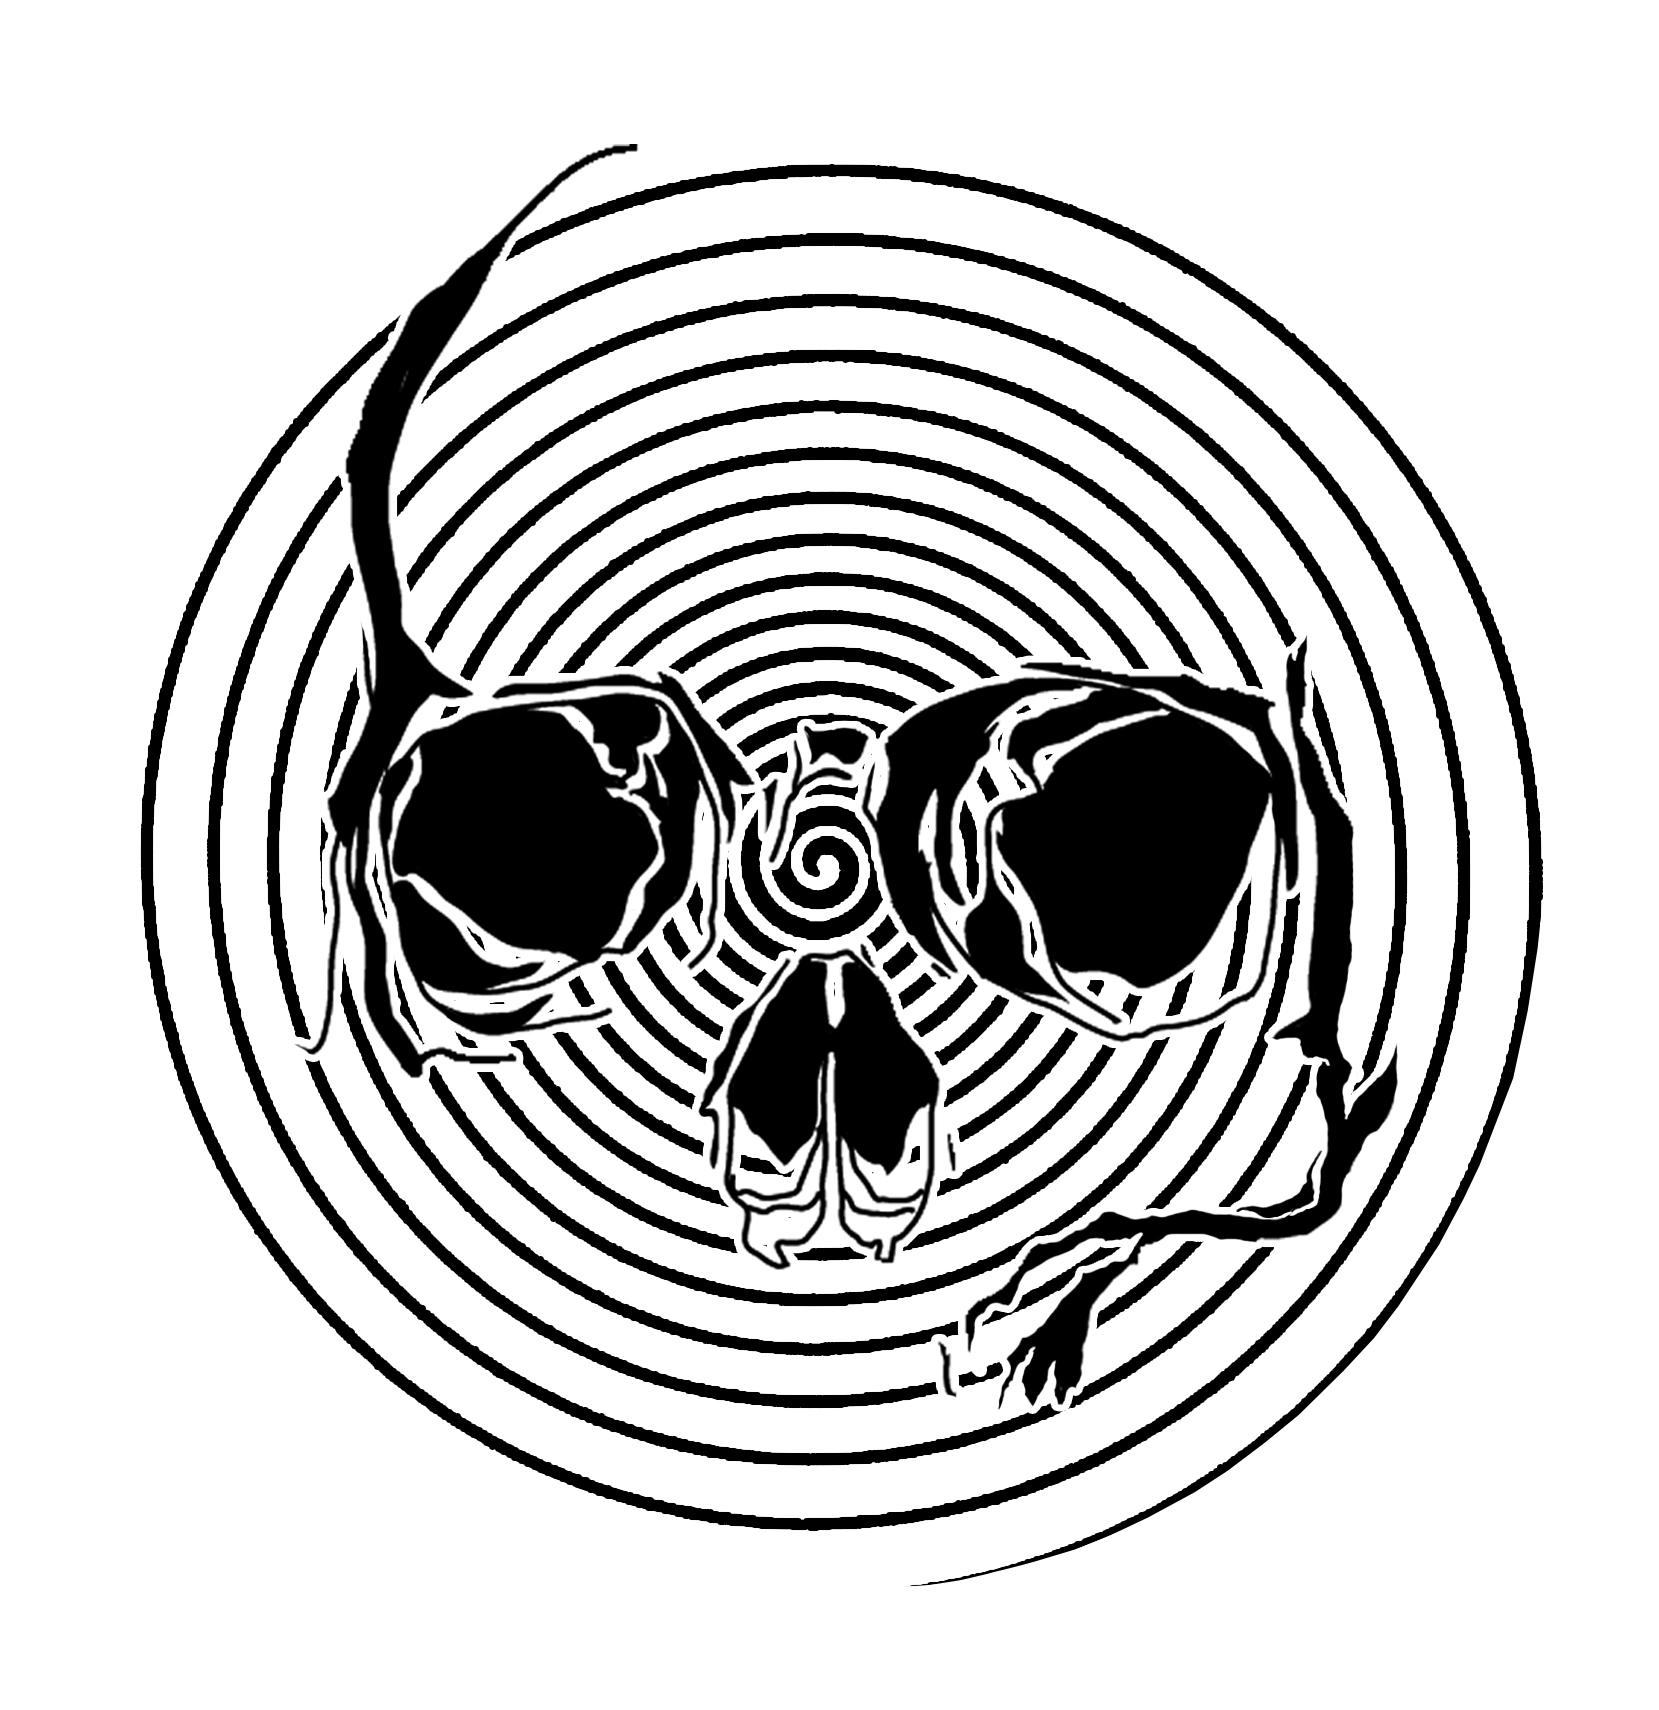 Design t shirts logo - Board Game Design